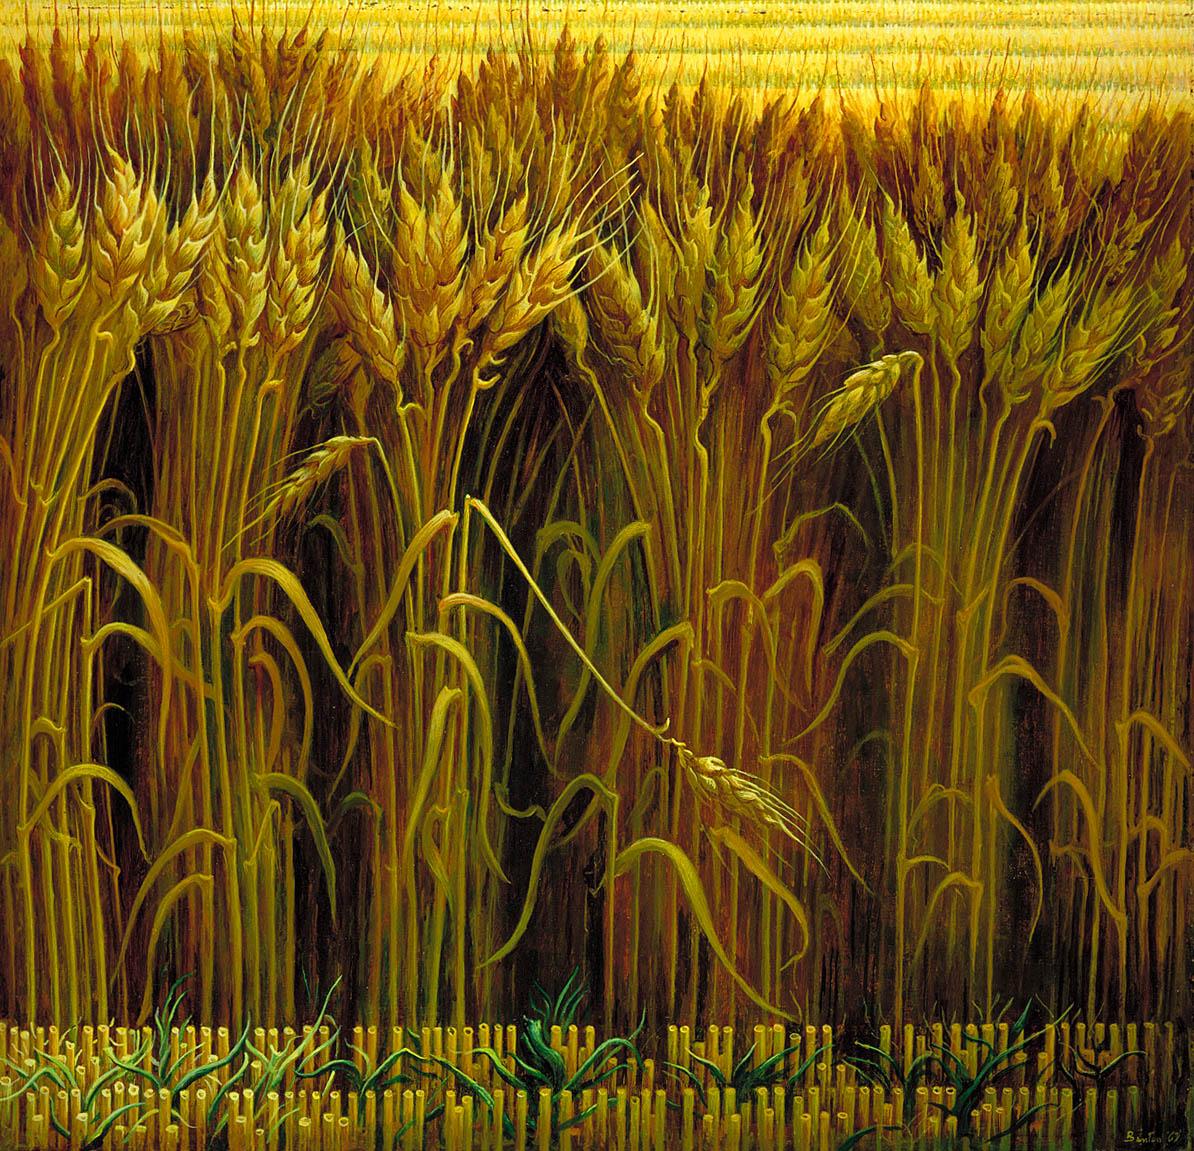 http://3.bp.blogspot.com/-GrKdLDR4uyY/Td13vtCtvNI/AAAAAAAAAI4/Q3-GOz04TJo/s1600/Thomas+Hart+Benton+Wheat+1967.jpg